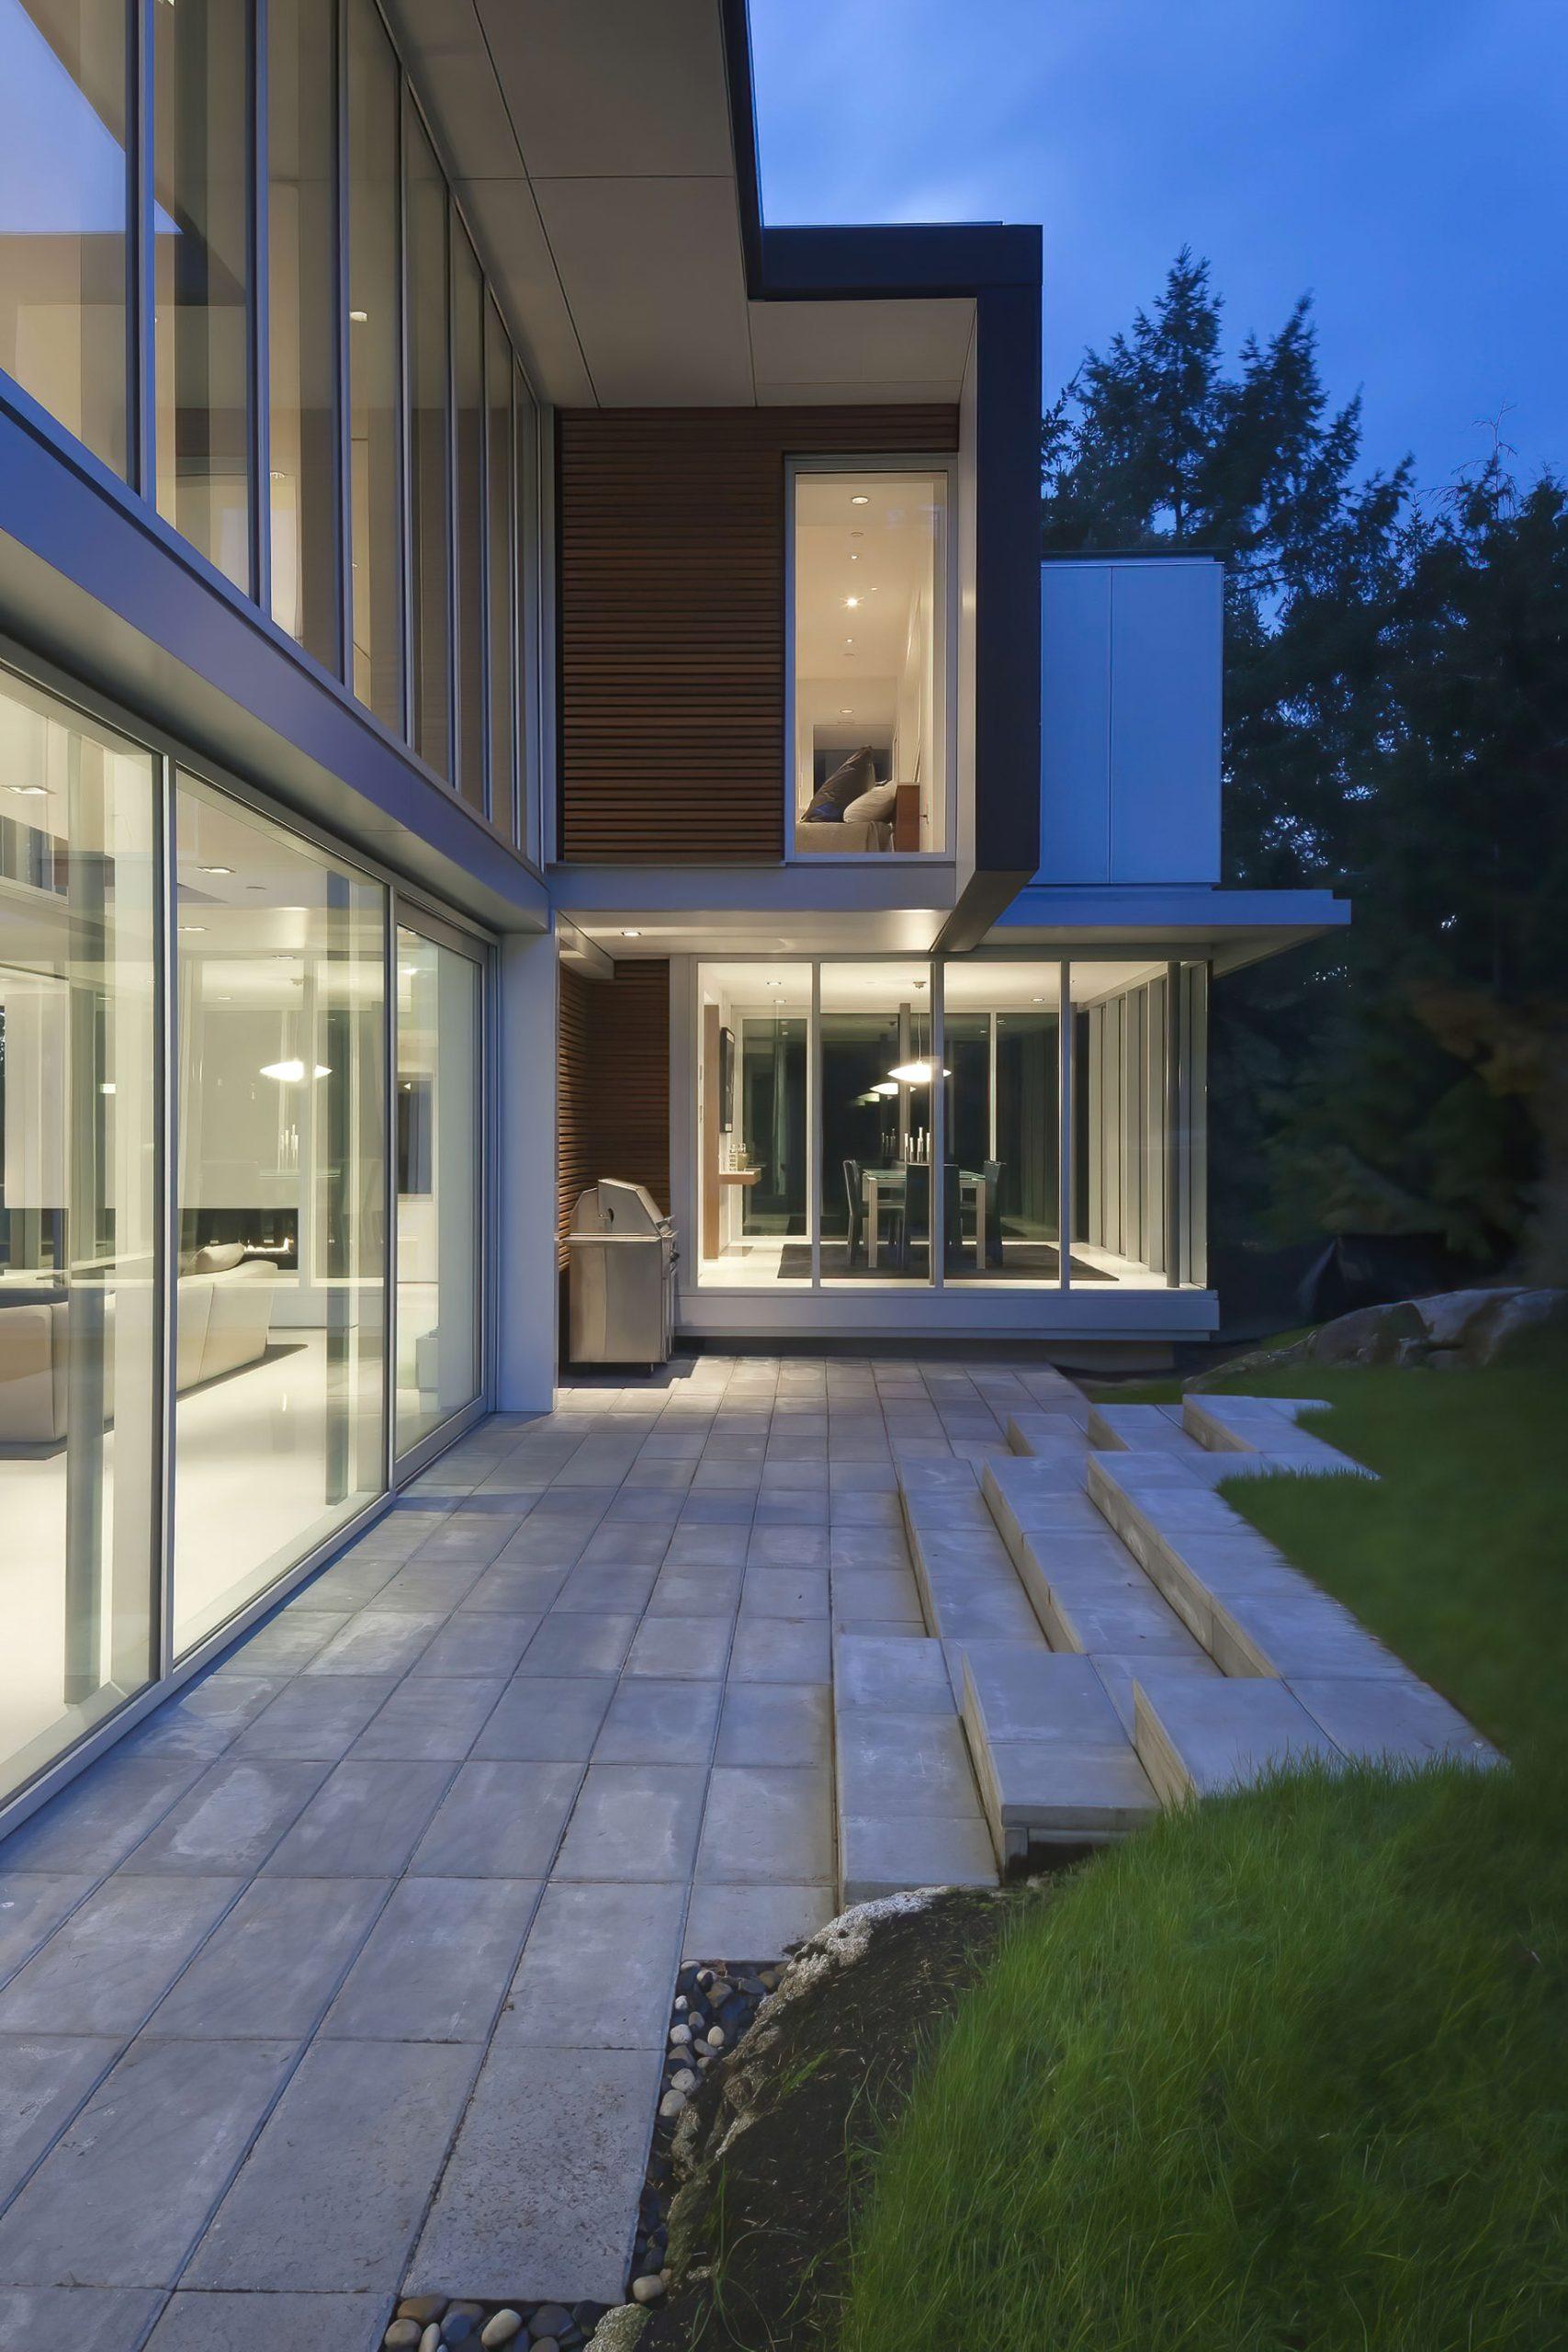 West Coast Modern – 4249 Rockbank Place, West Vancouver, BC, Canada